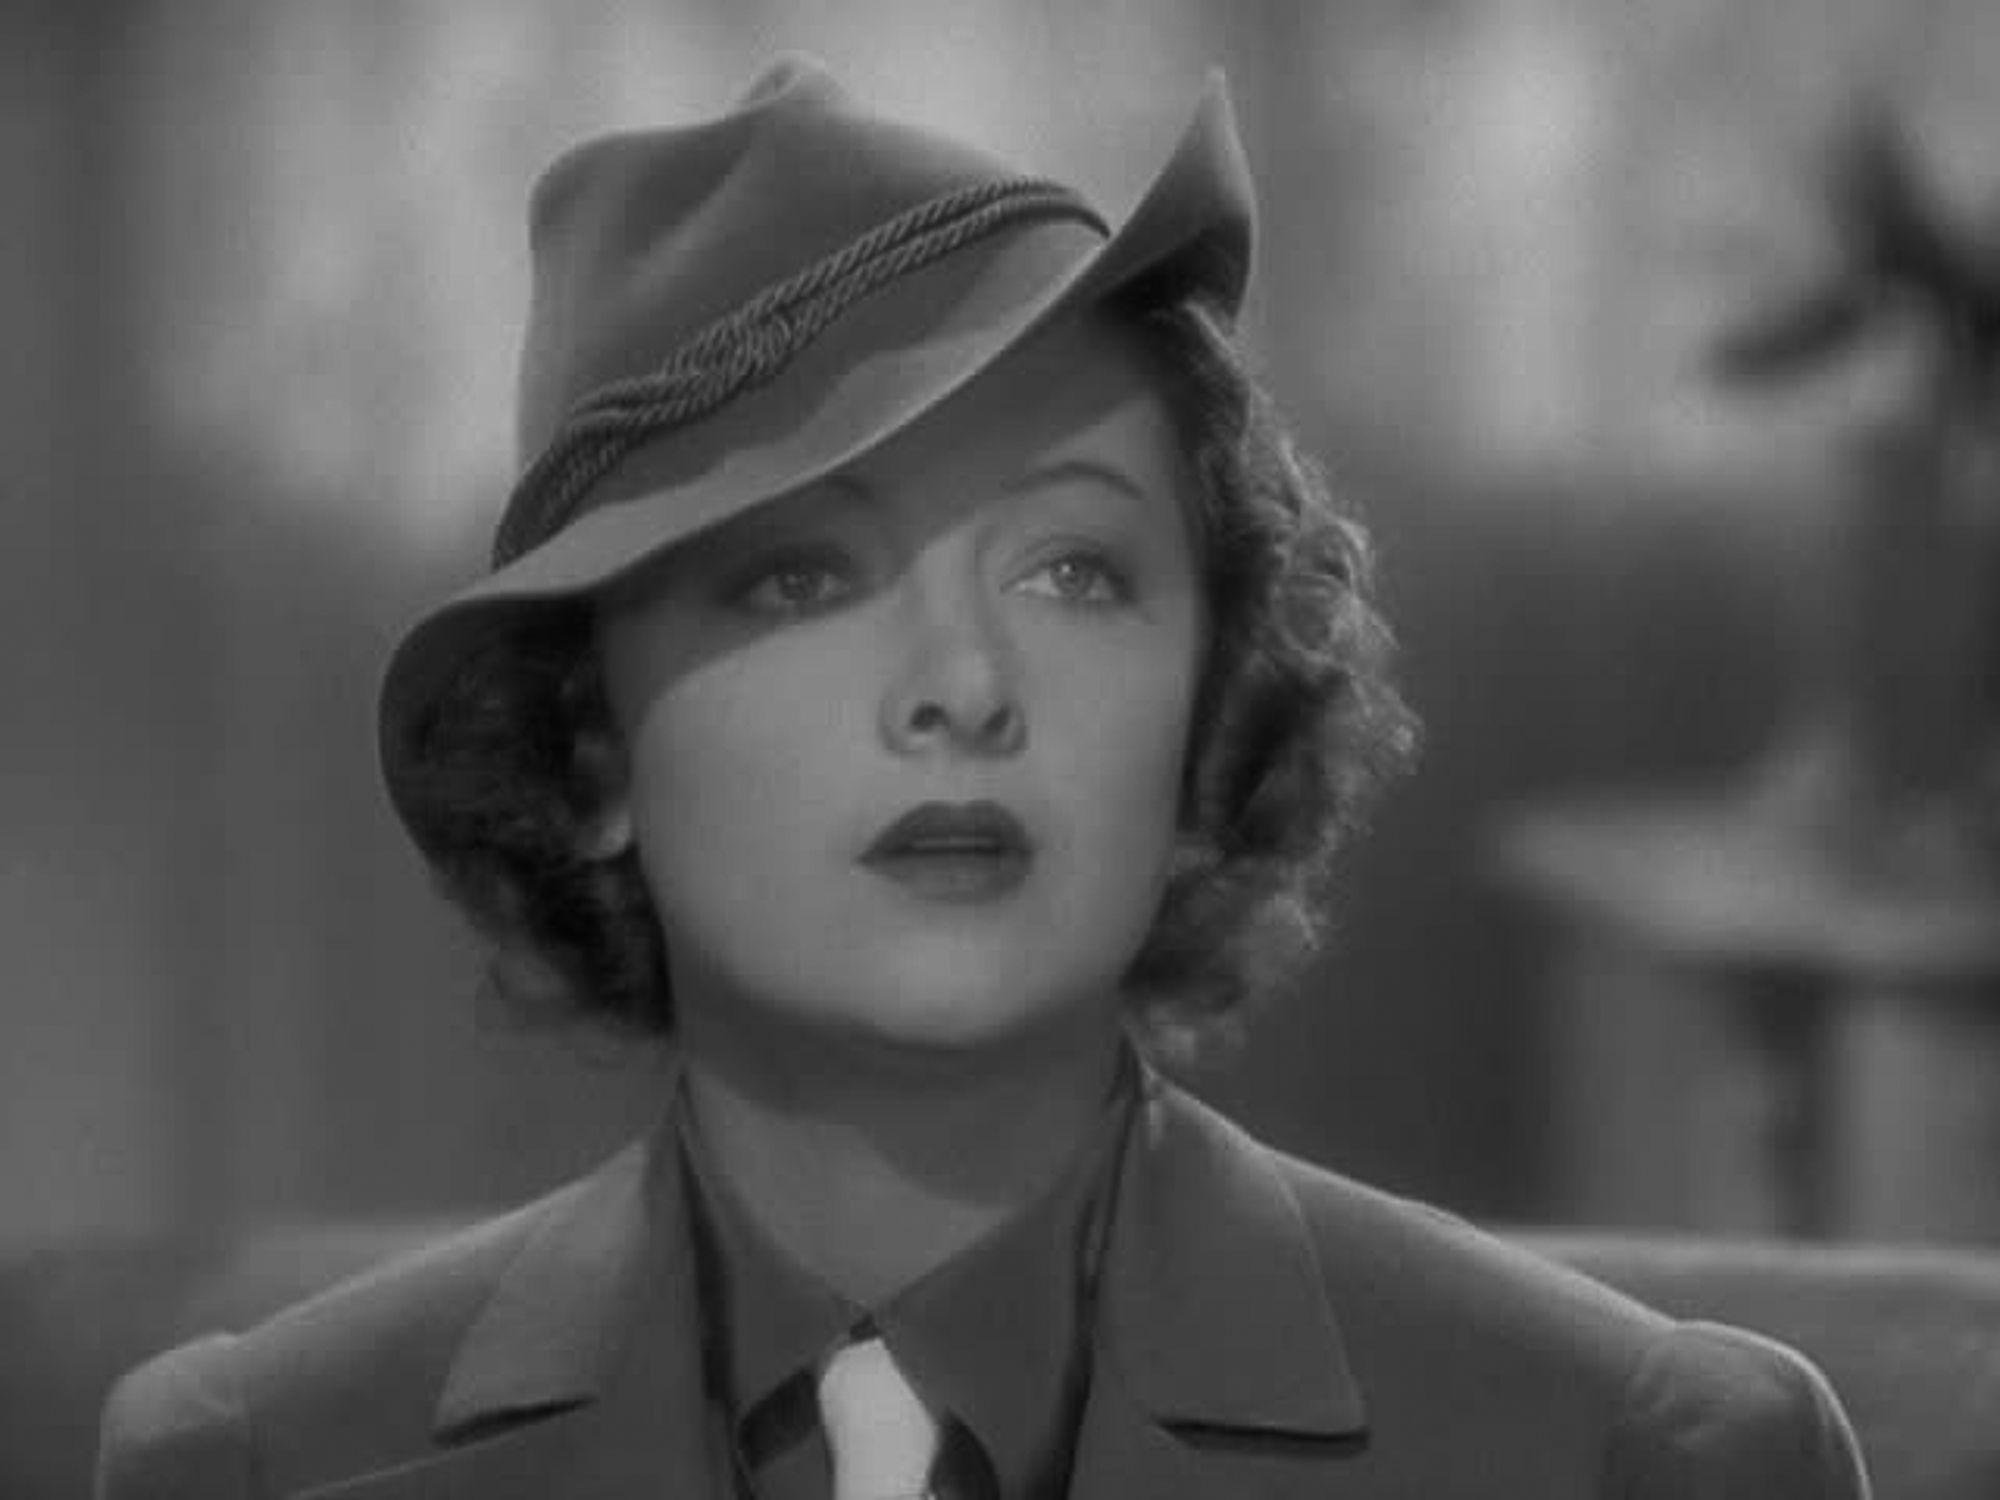 Myrna Loy in The Squall 1929 | Classic film stars, Myrna